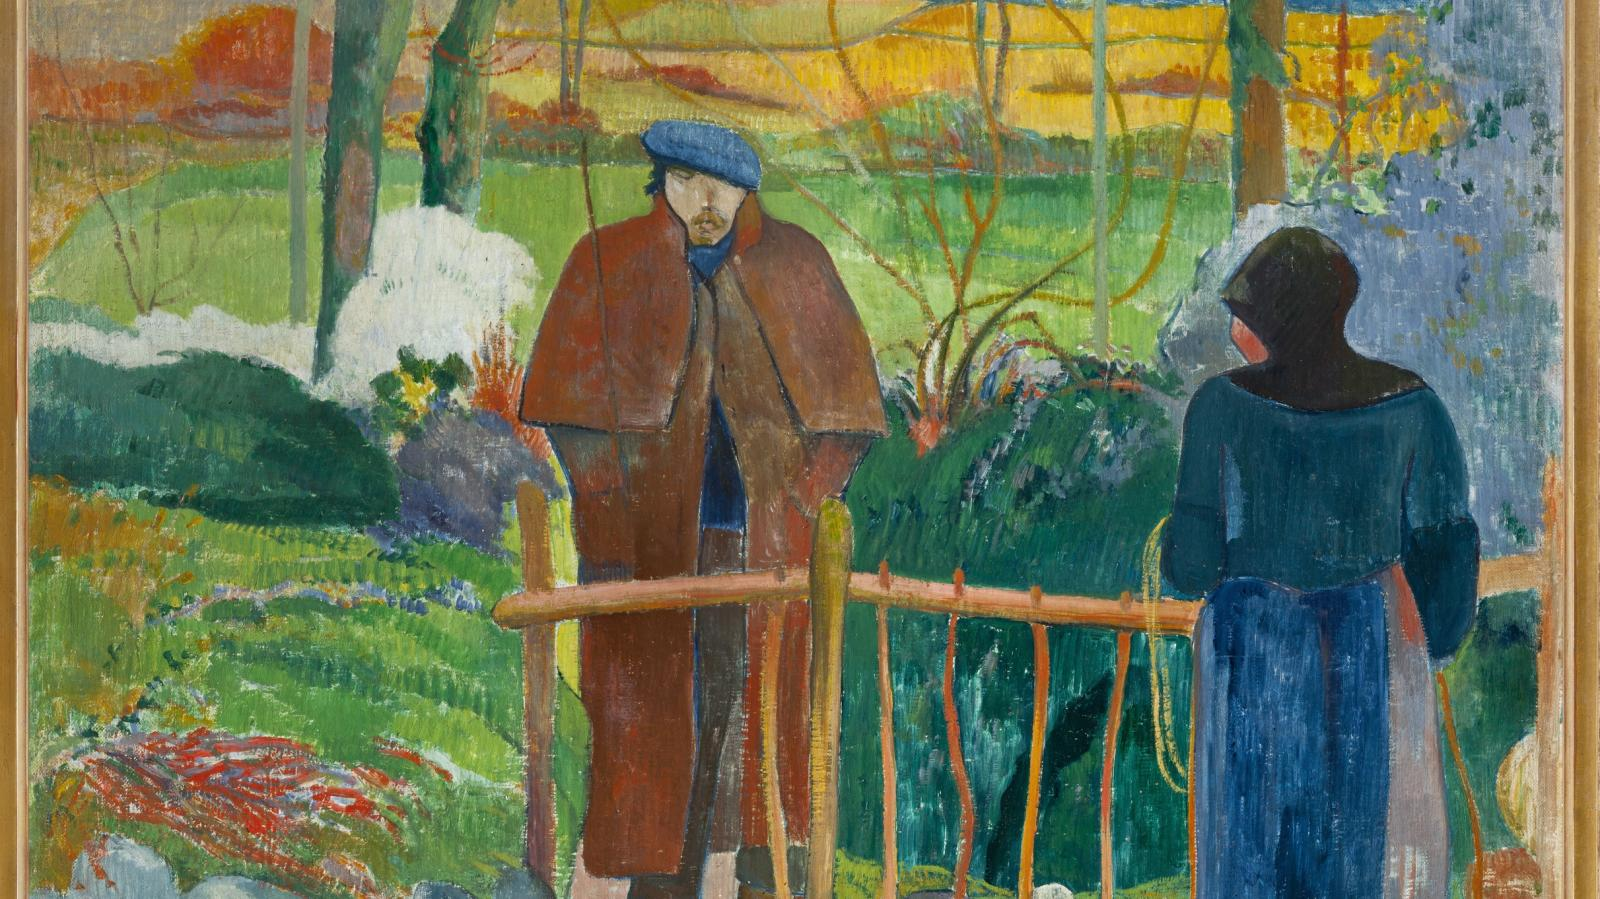 Paul Gauguin / Bonjour, Monsieur Gauguin (1889)